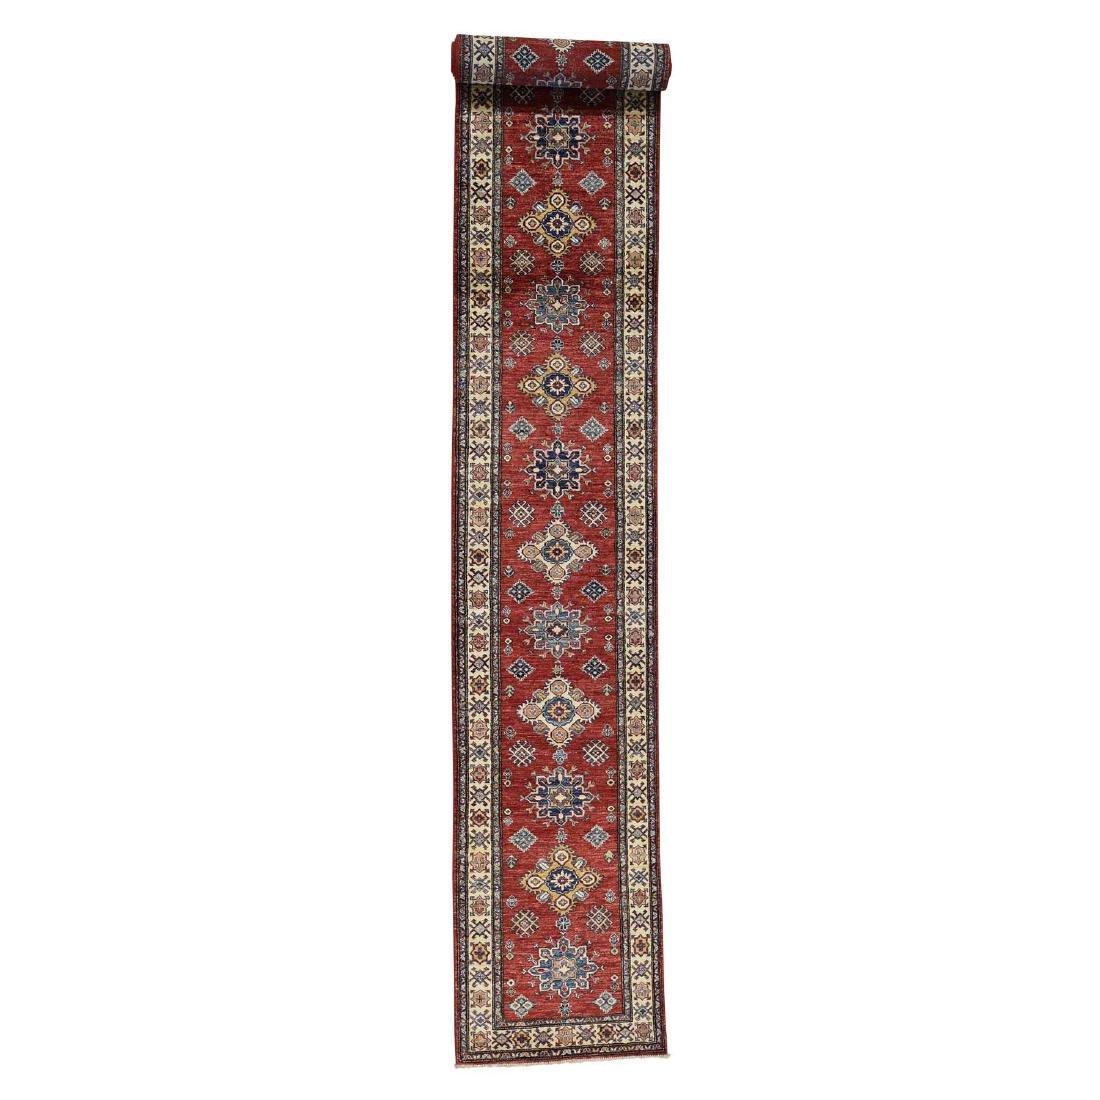 Hand-Knotted Pure Wool Red Super Kazak XL Runner Rug